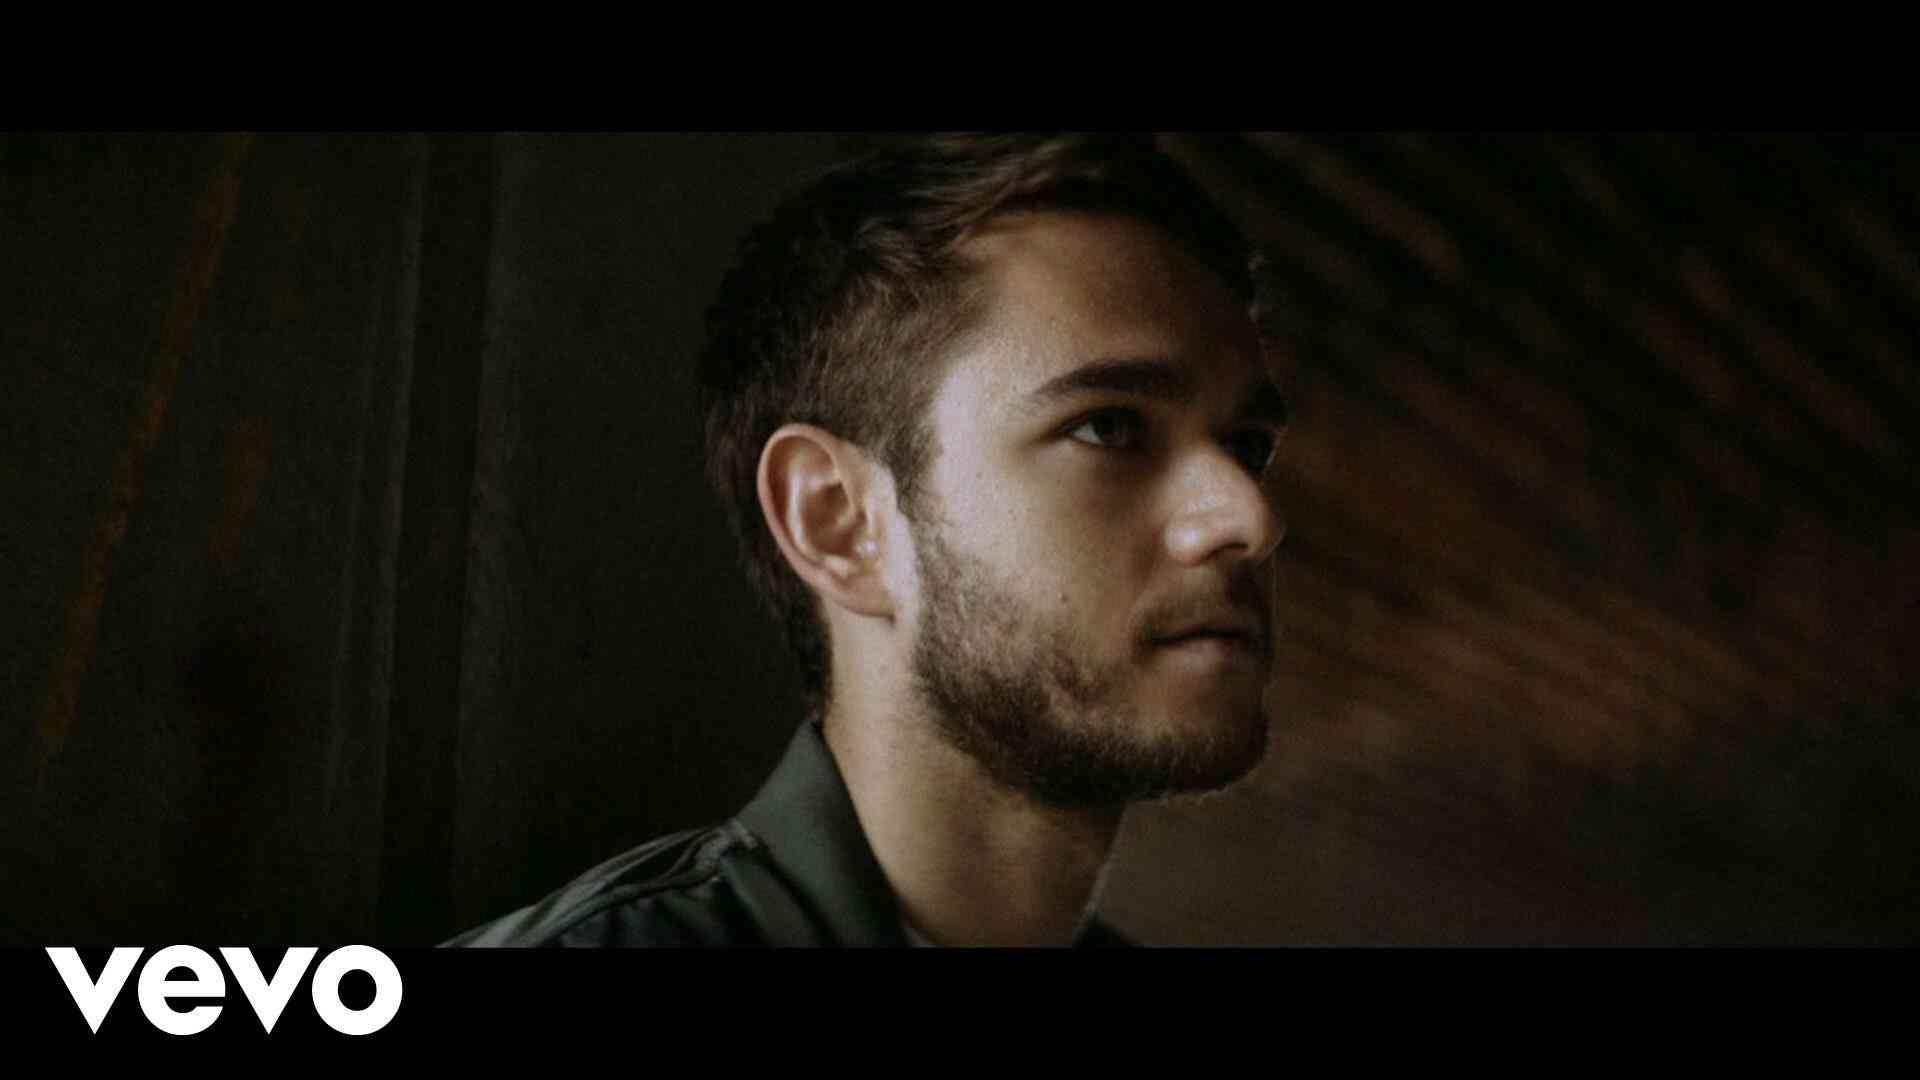 Zedd - Beautiful Now ft. Jon Bellion - YouTube